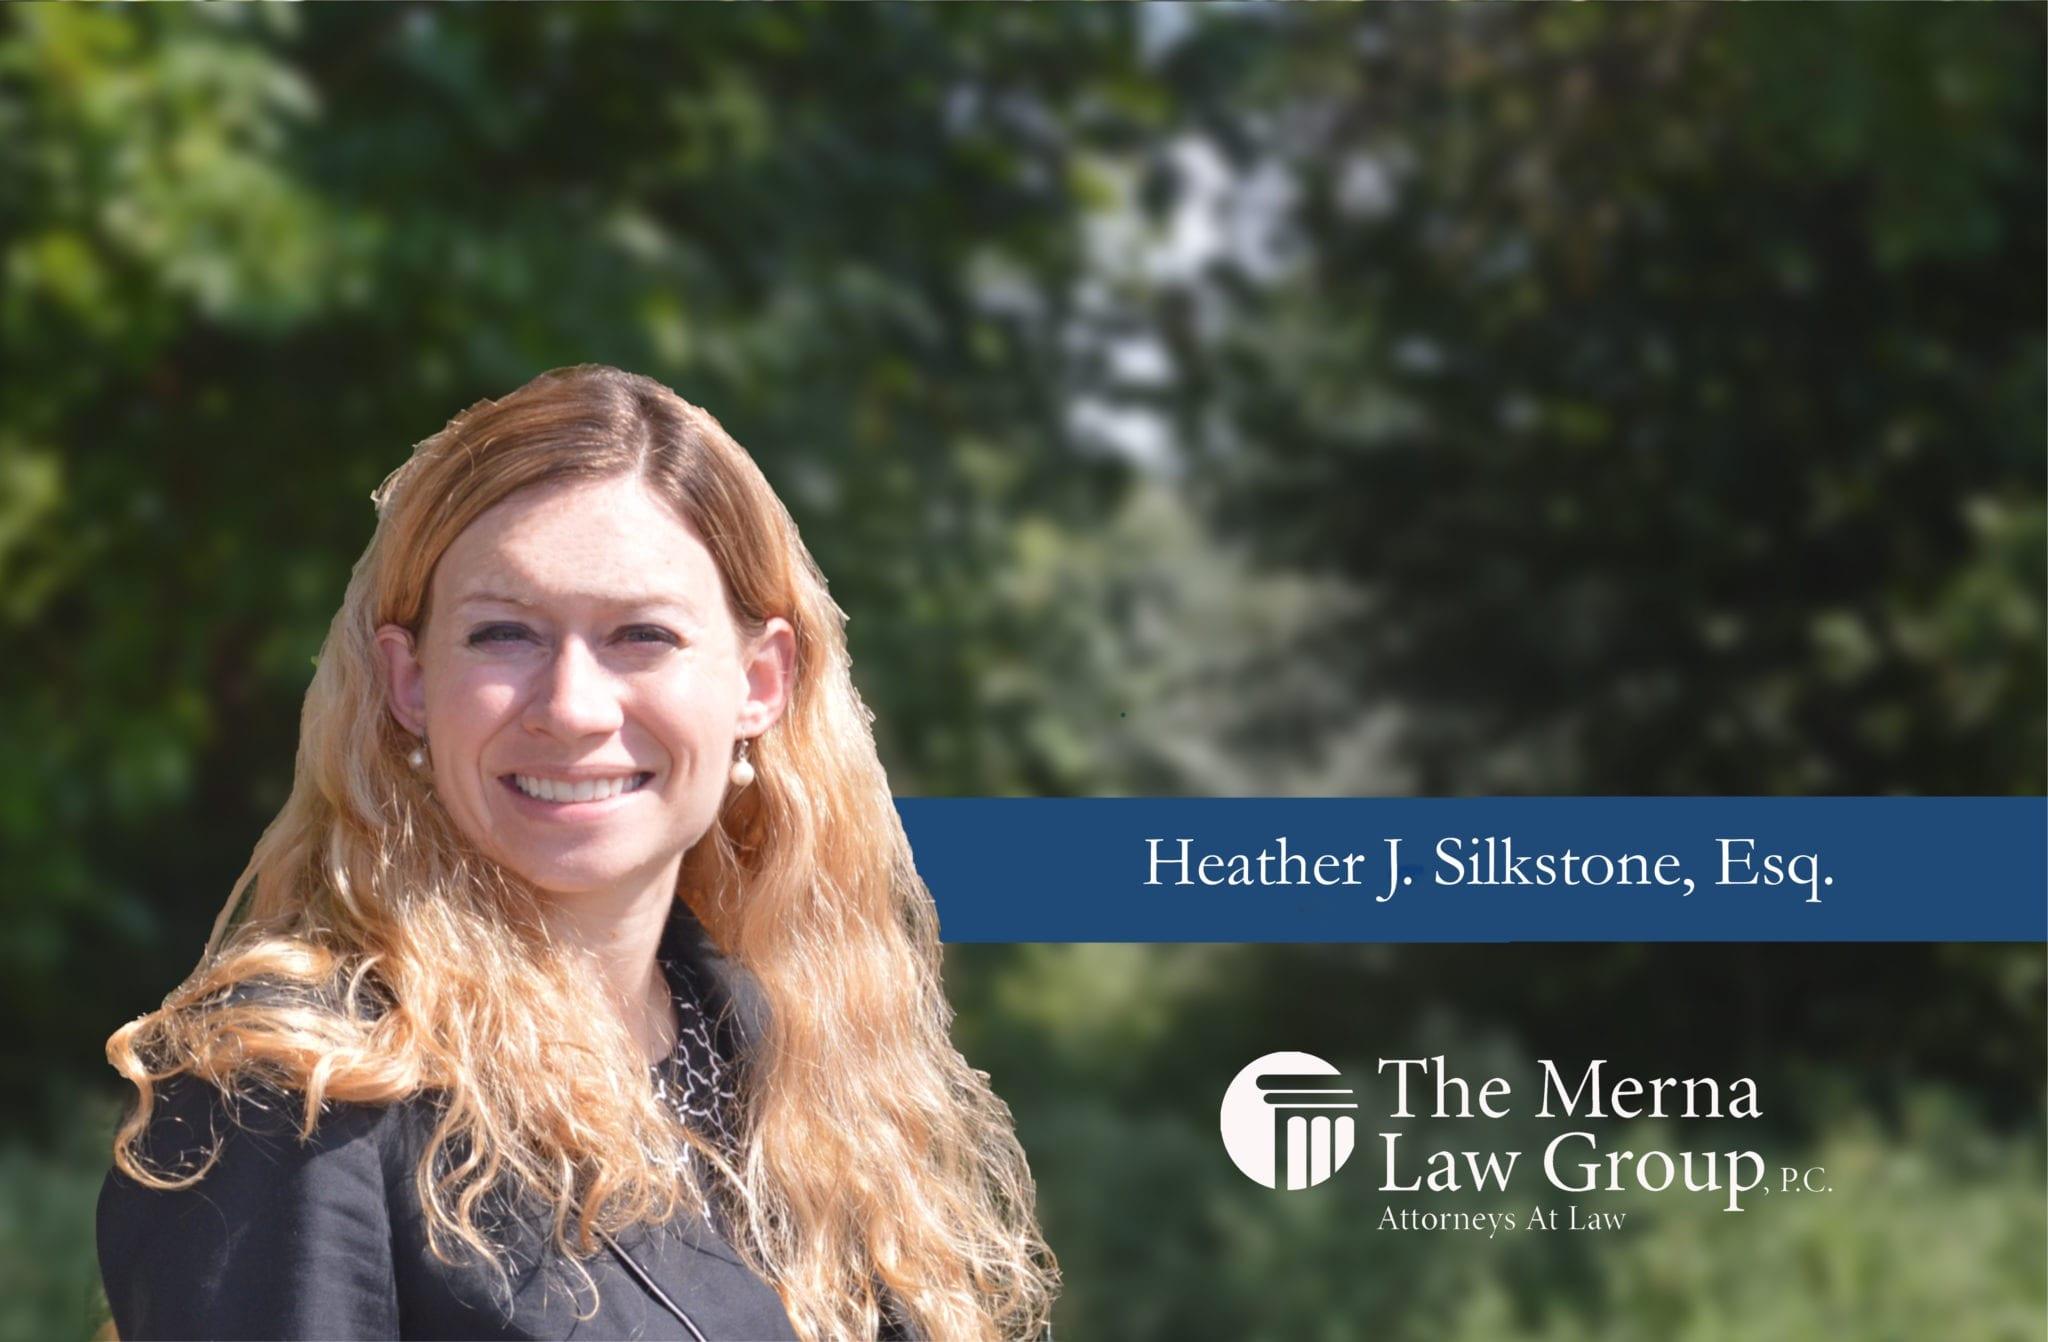 Best bankruptcy lawyer richmond, chesterfield, henrico, petersburg